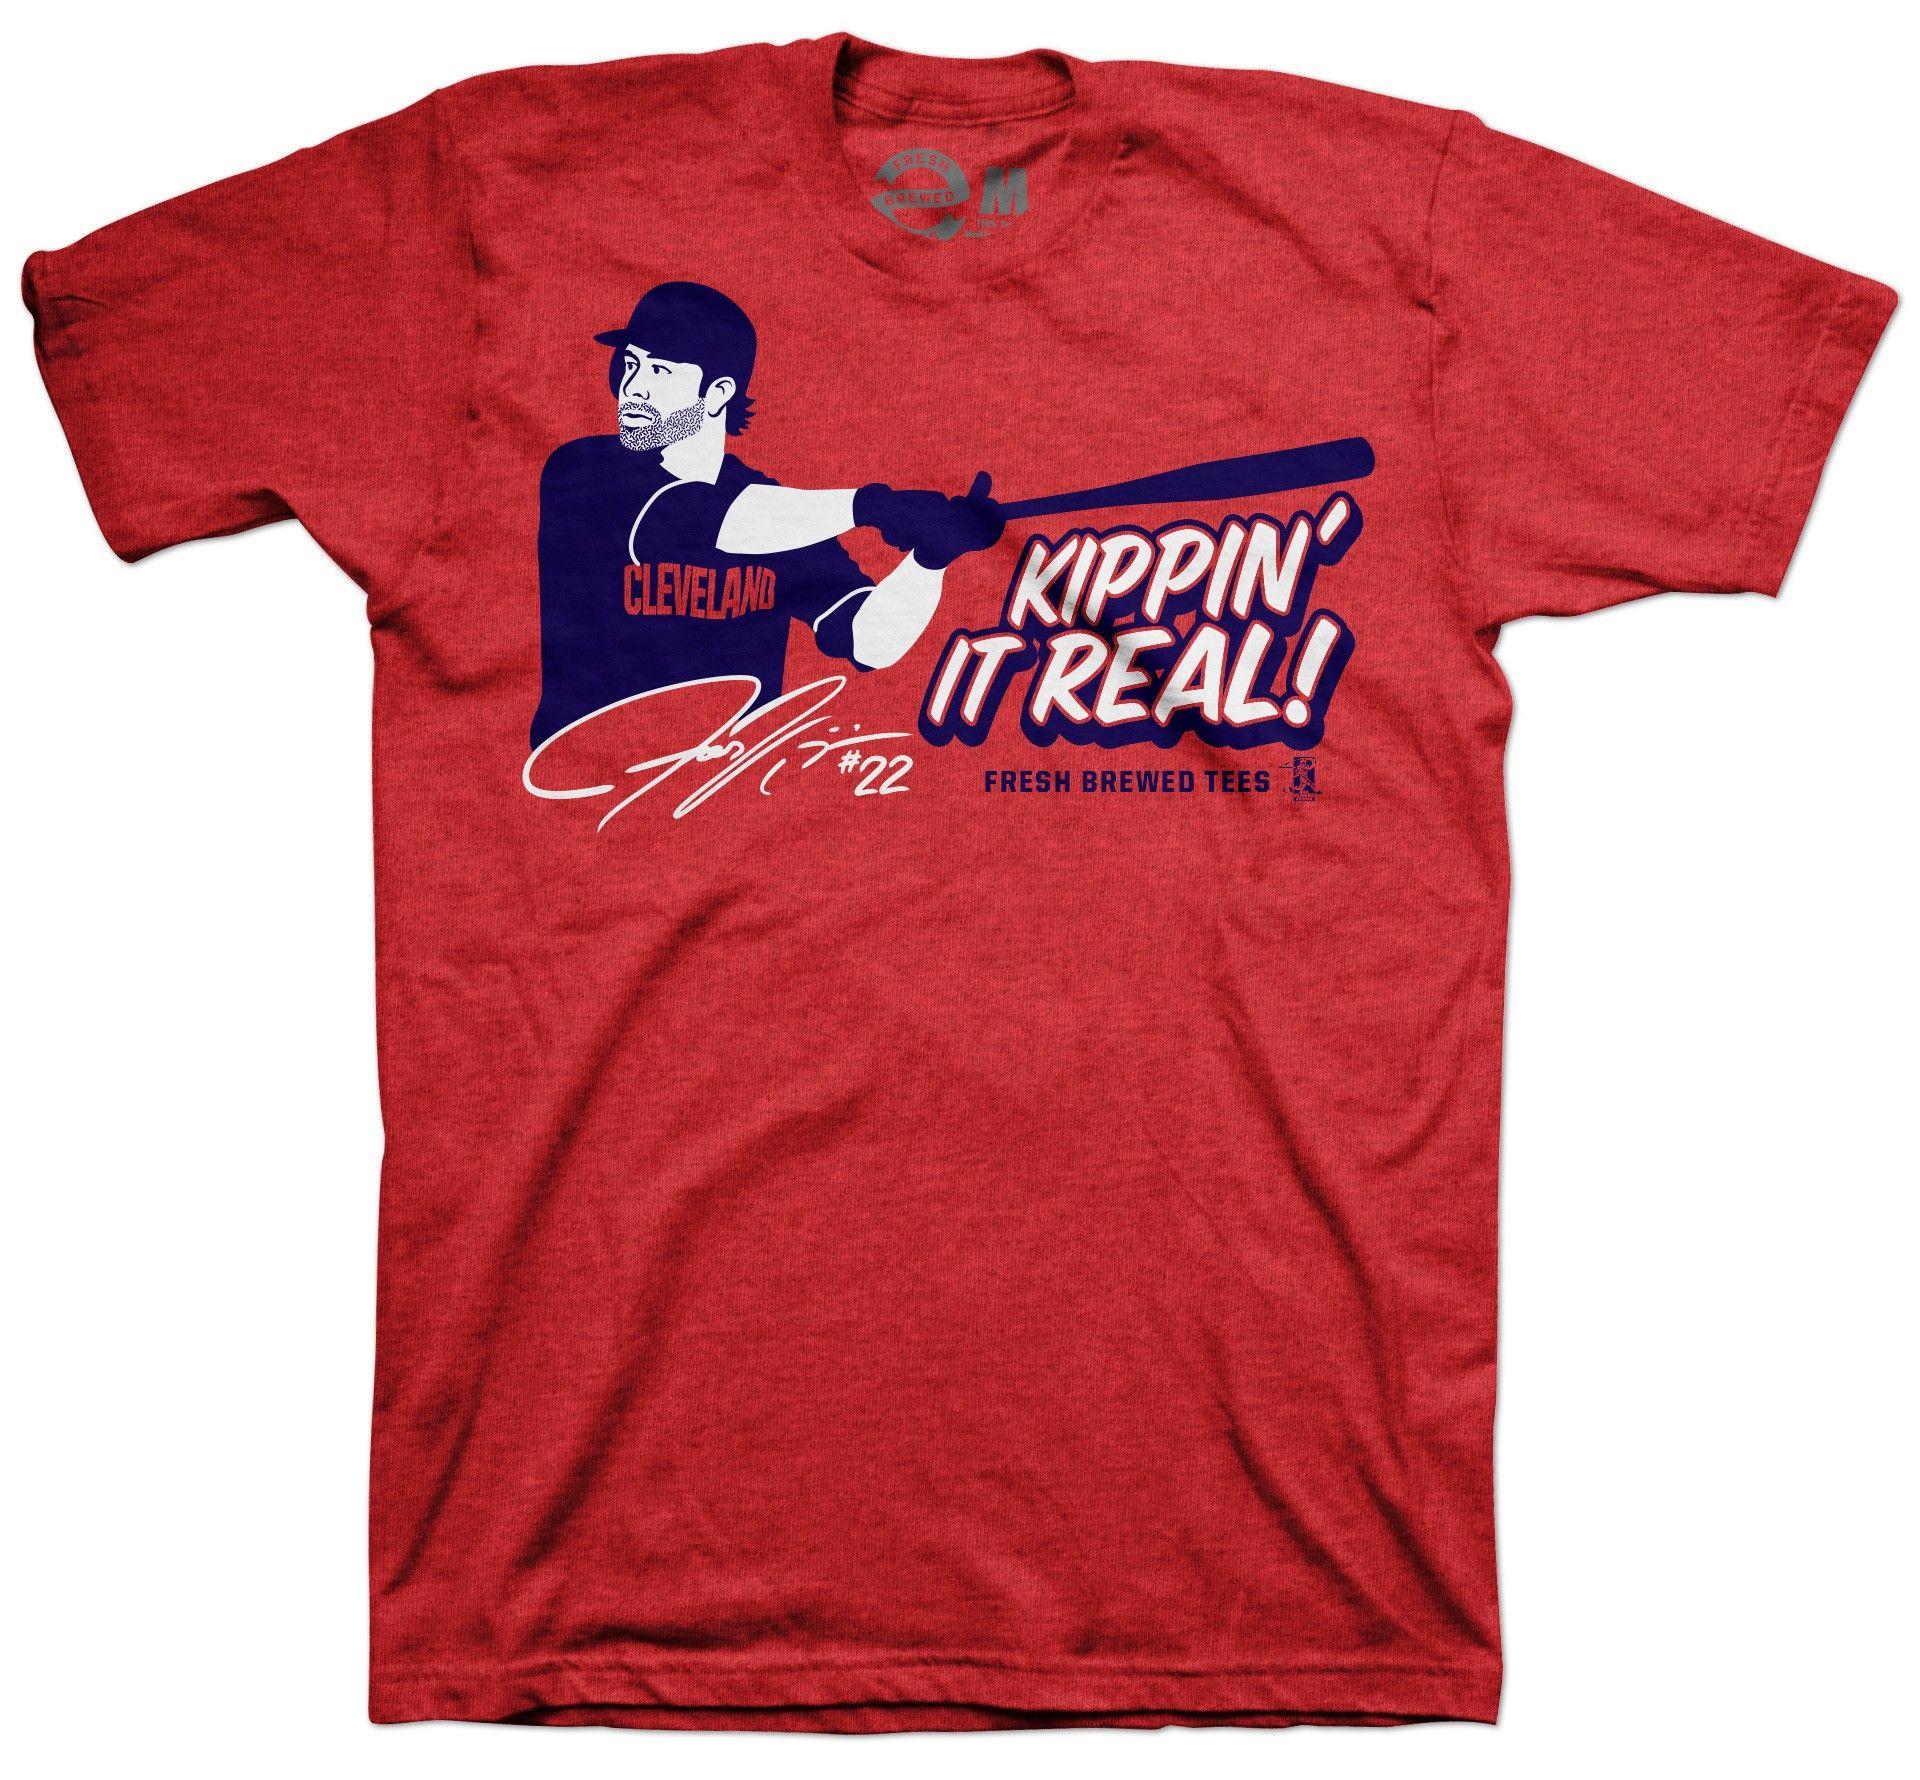 Kippin' It Real T-Shirt